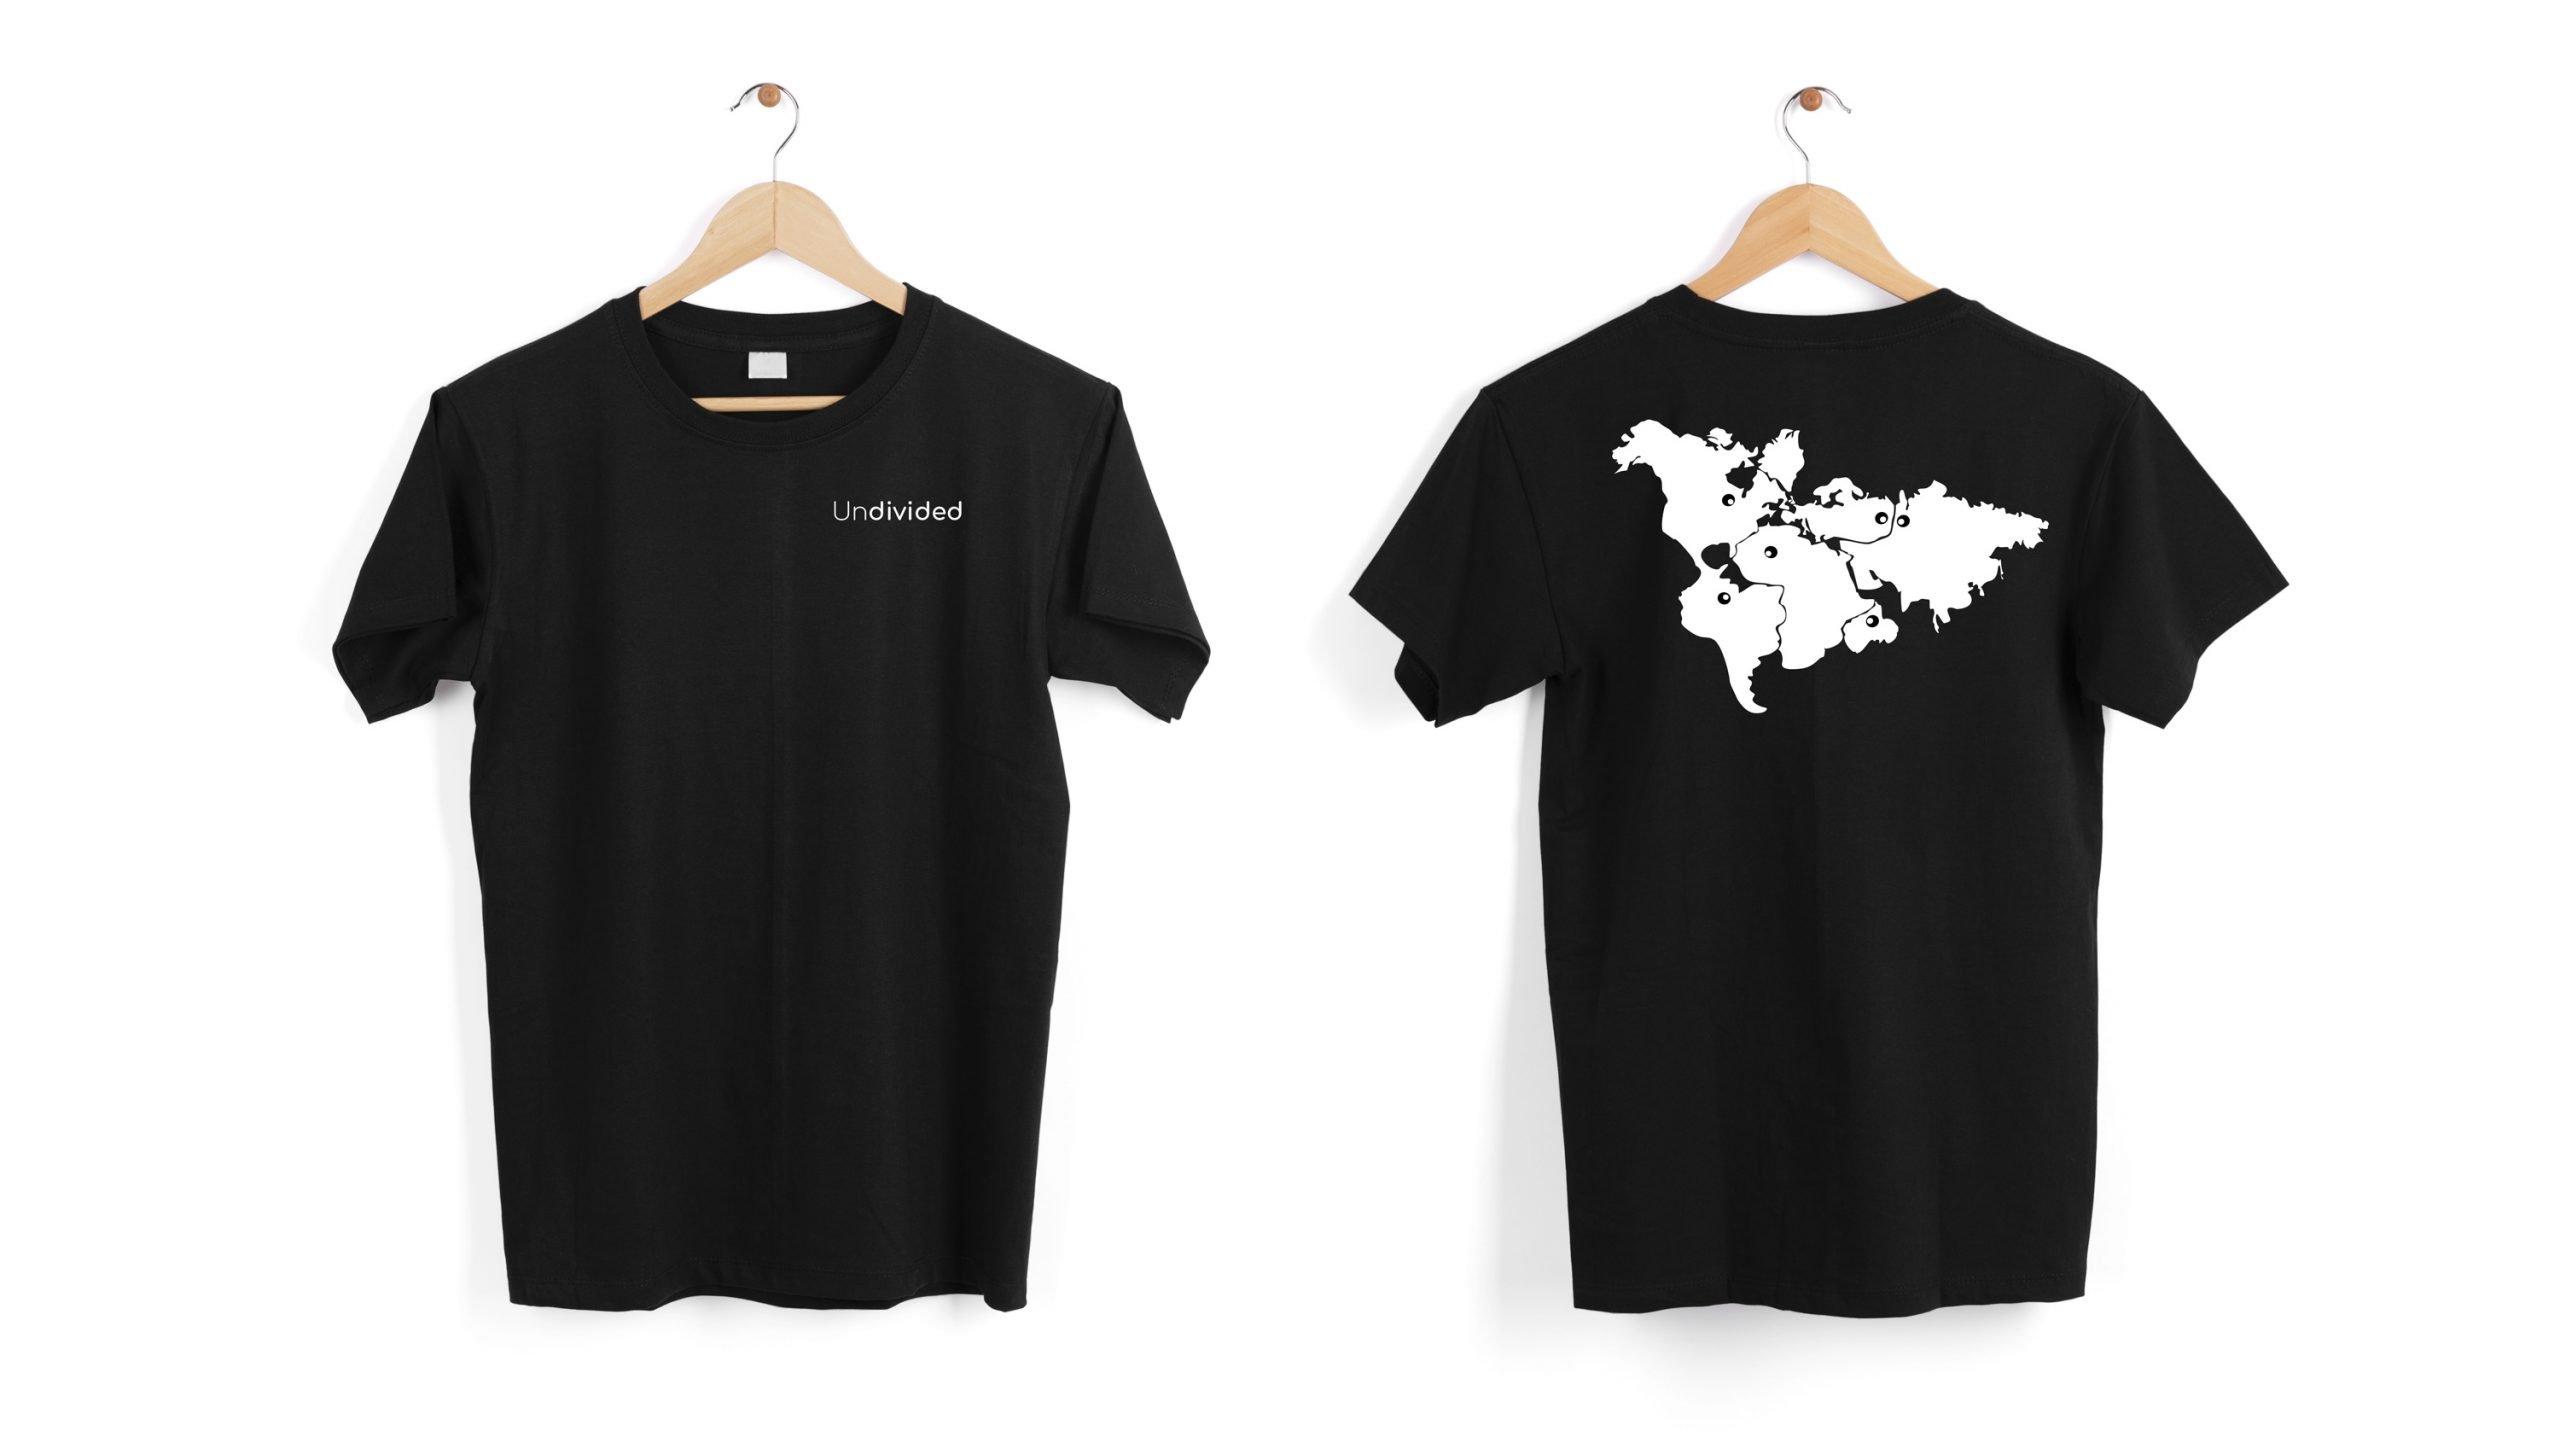 World Map T-Shirt Illustration by Mattia Pesiri- AntonellaM